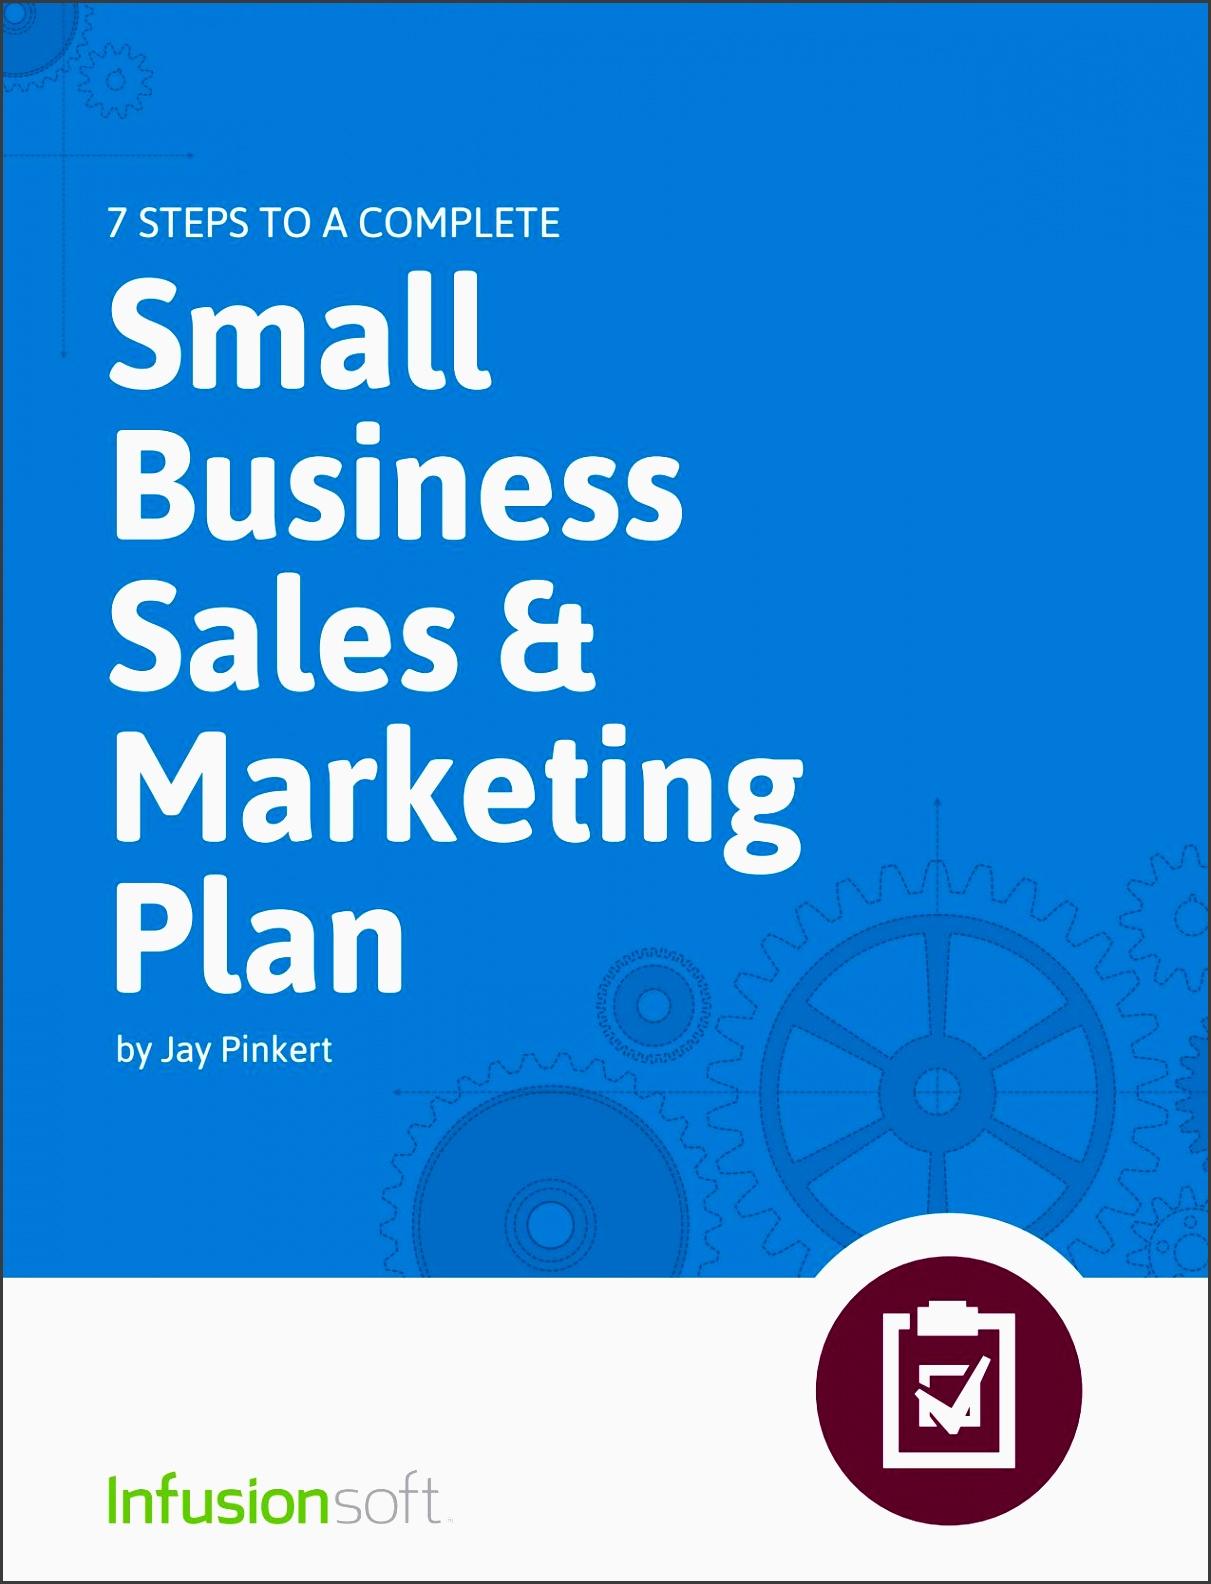 marketing presentation examples free bar graph worksheets northern small business sales marketing plan 7 steps pdf